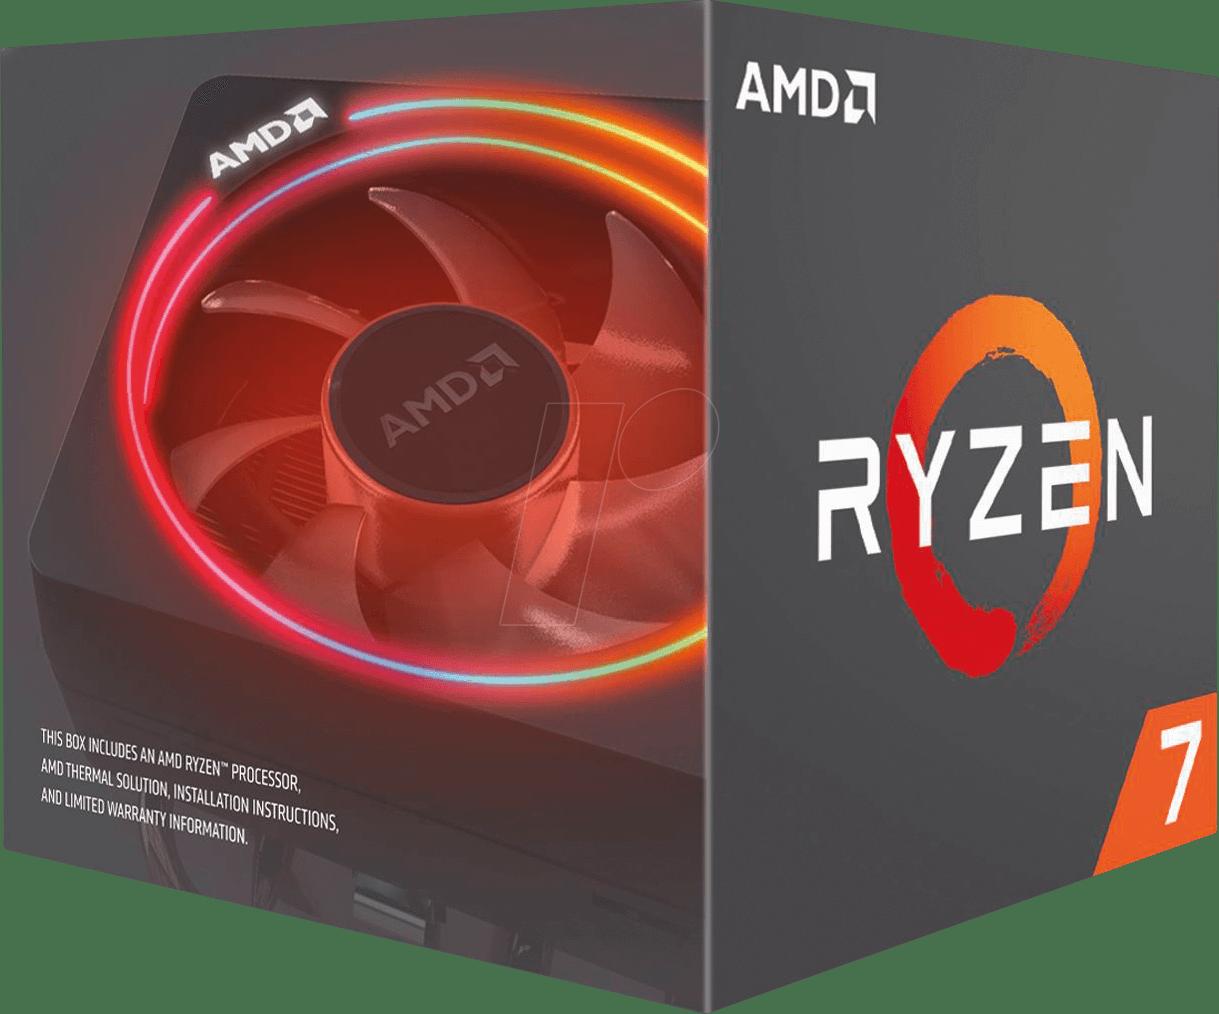 Gambar Box AMD Ryzen 7 Transparan